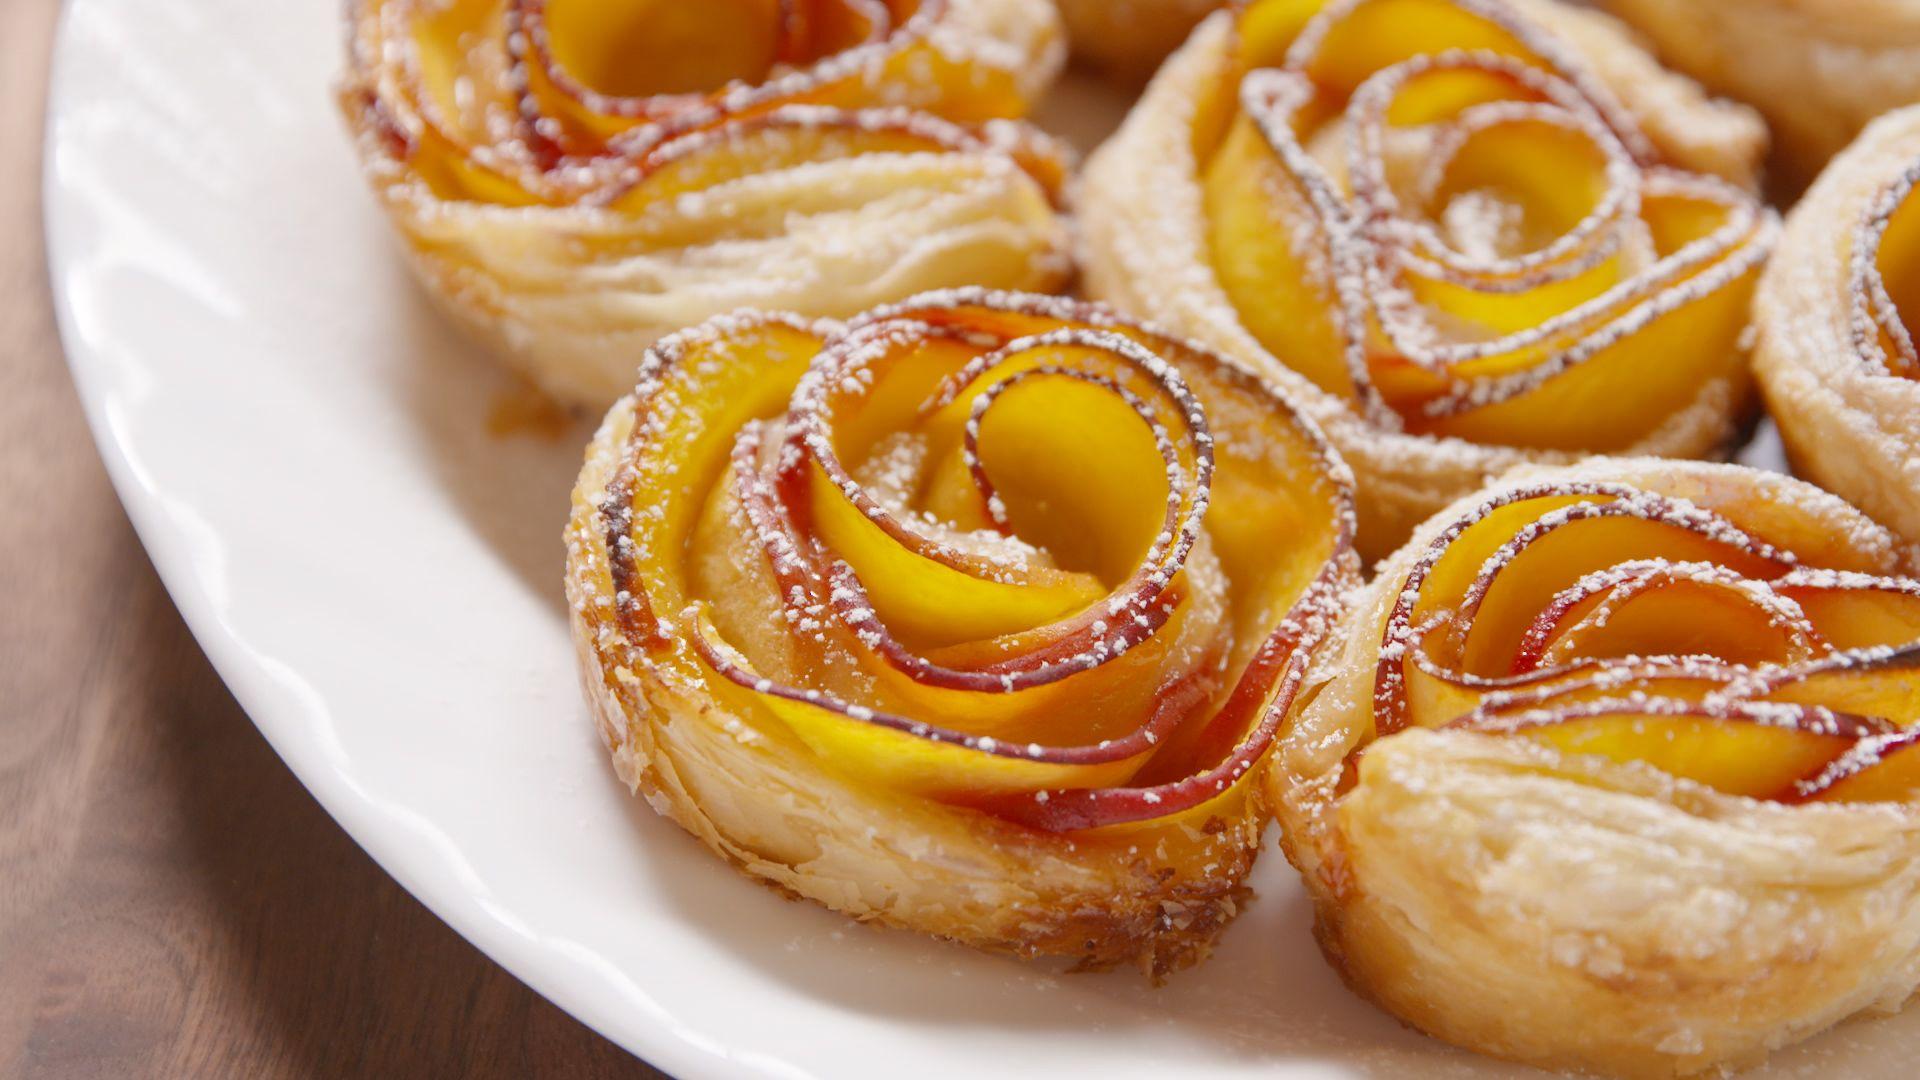 55+ Best Fruit Dessert Recipes - Easy Desserts with Fruit